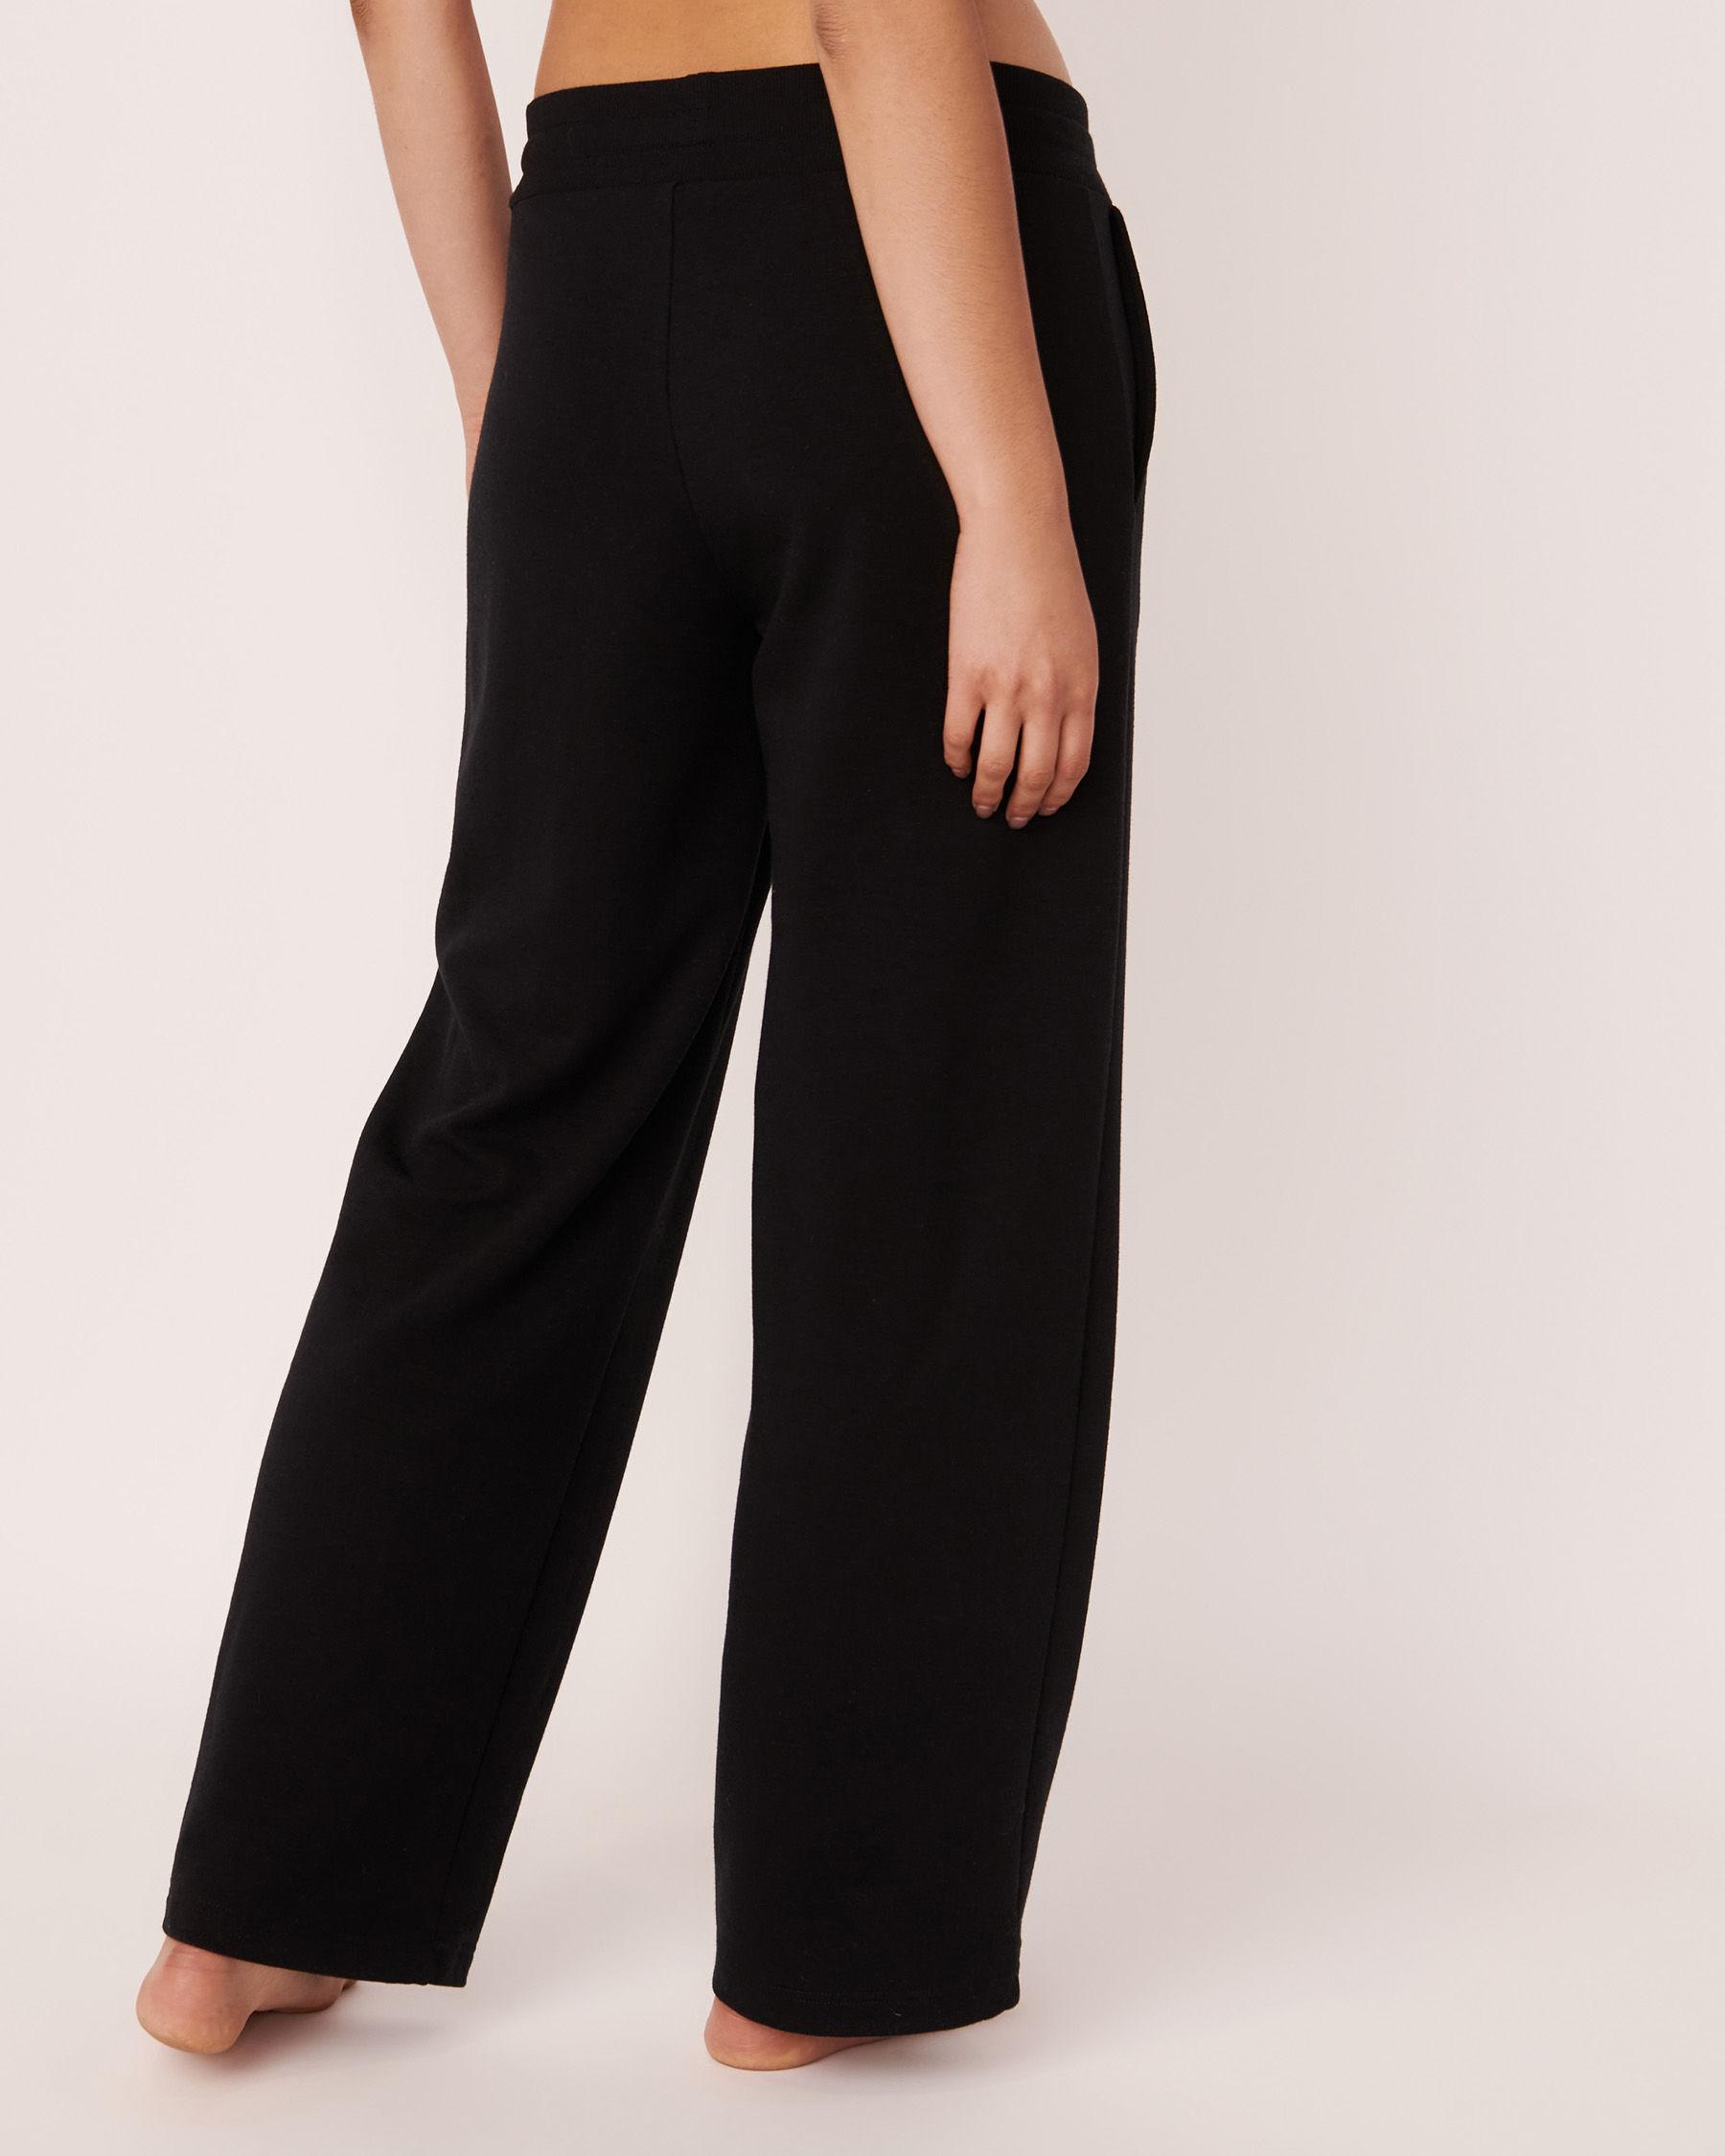 LA VIE EN ROSE Pantalon jambe large Noir 50200014 - Voir2